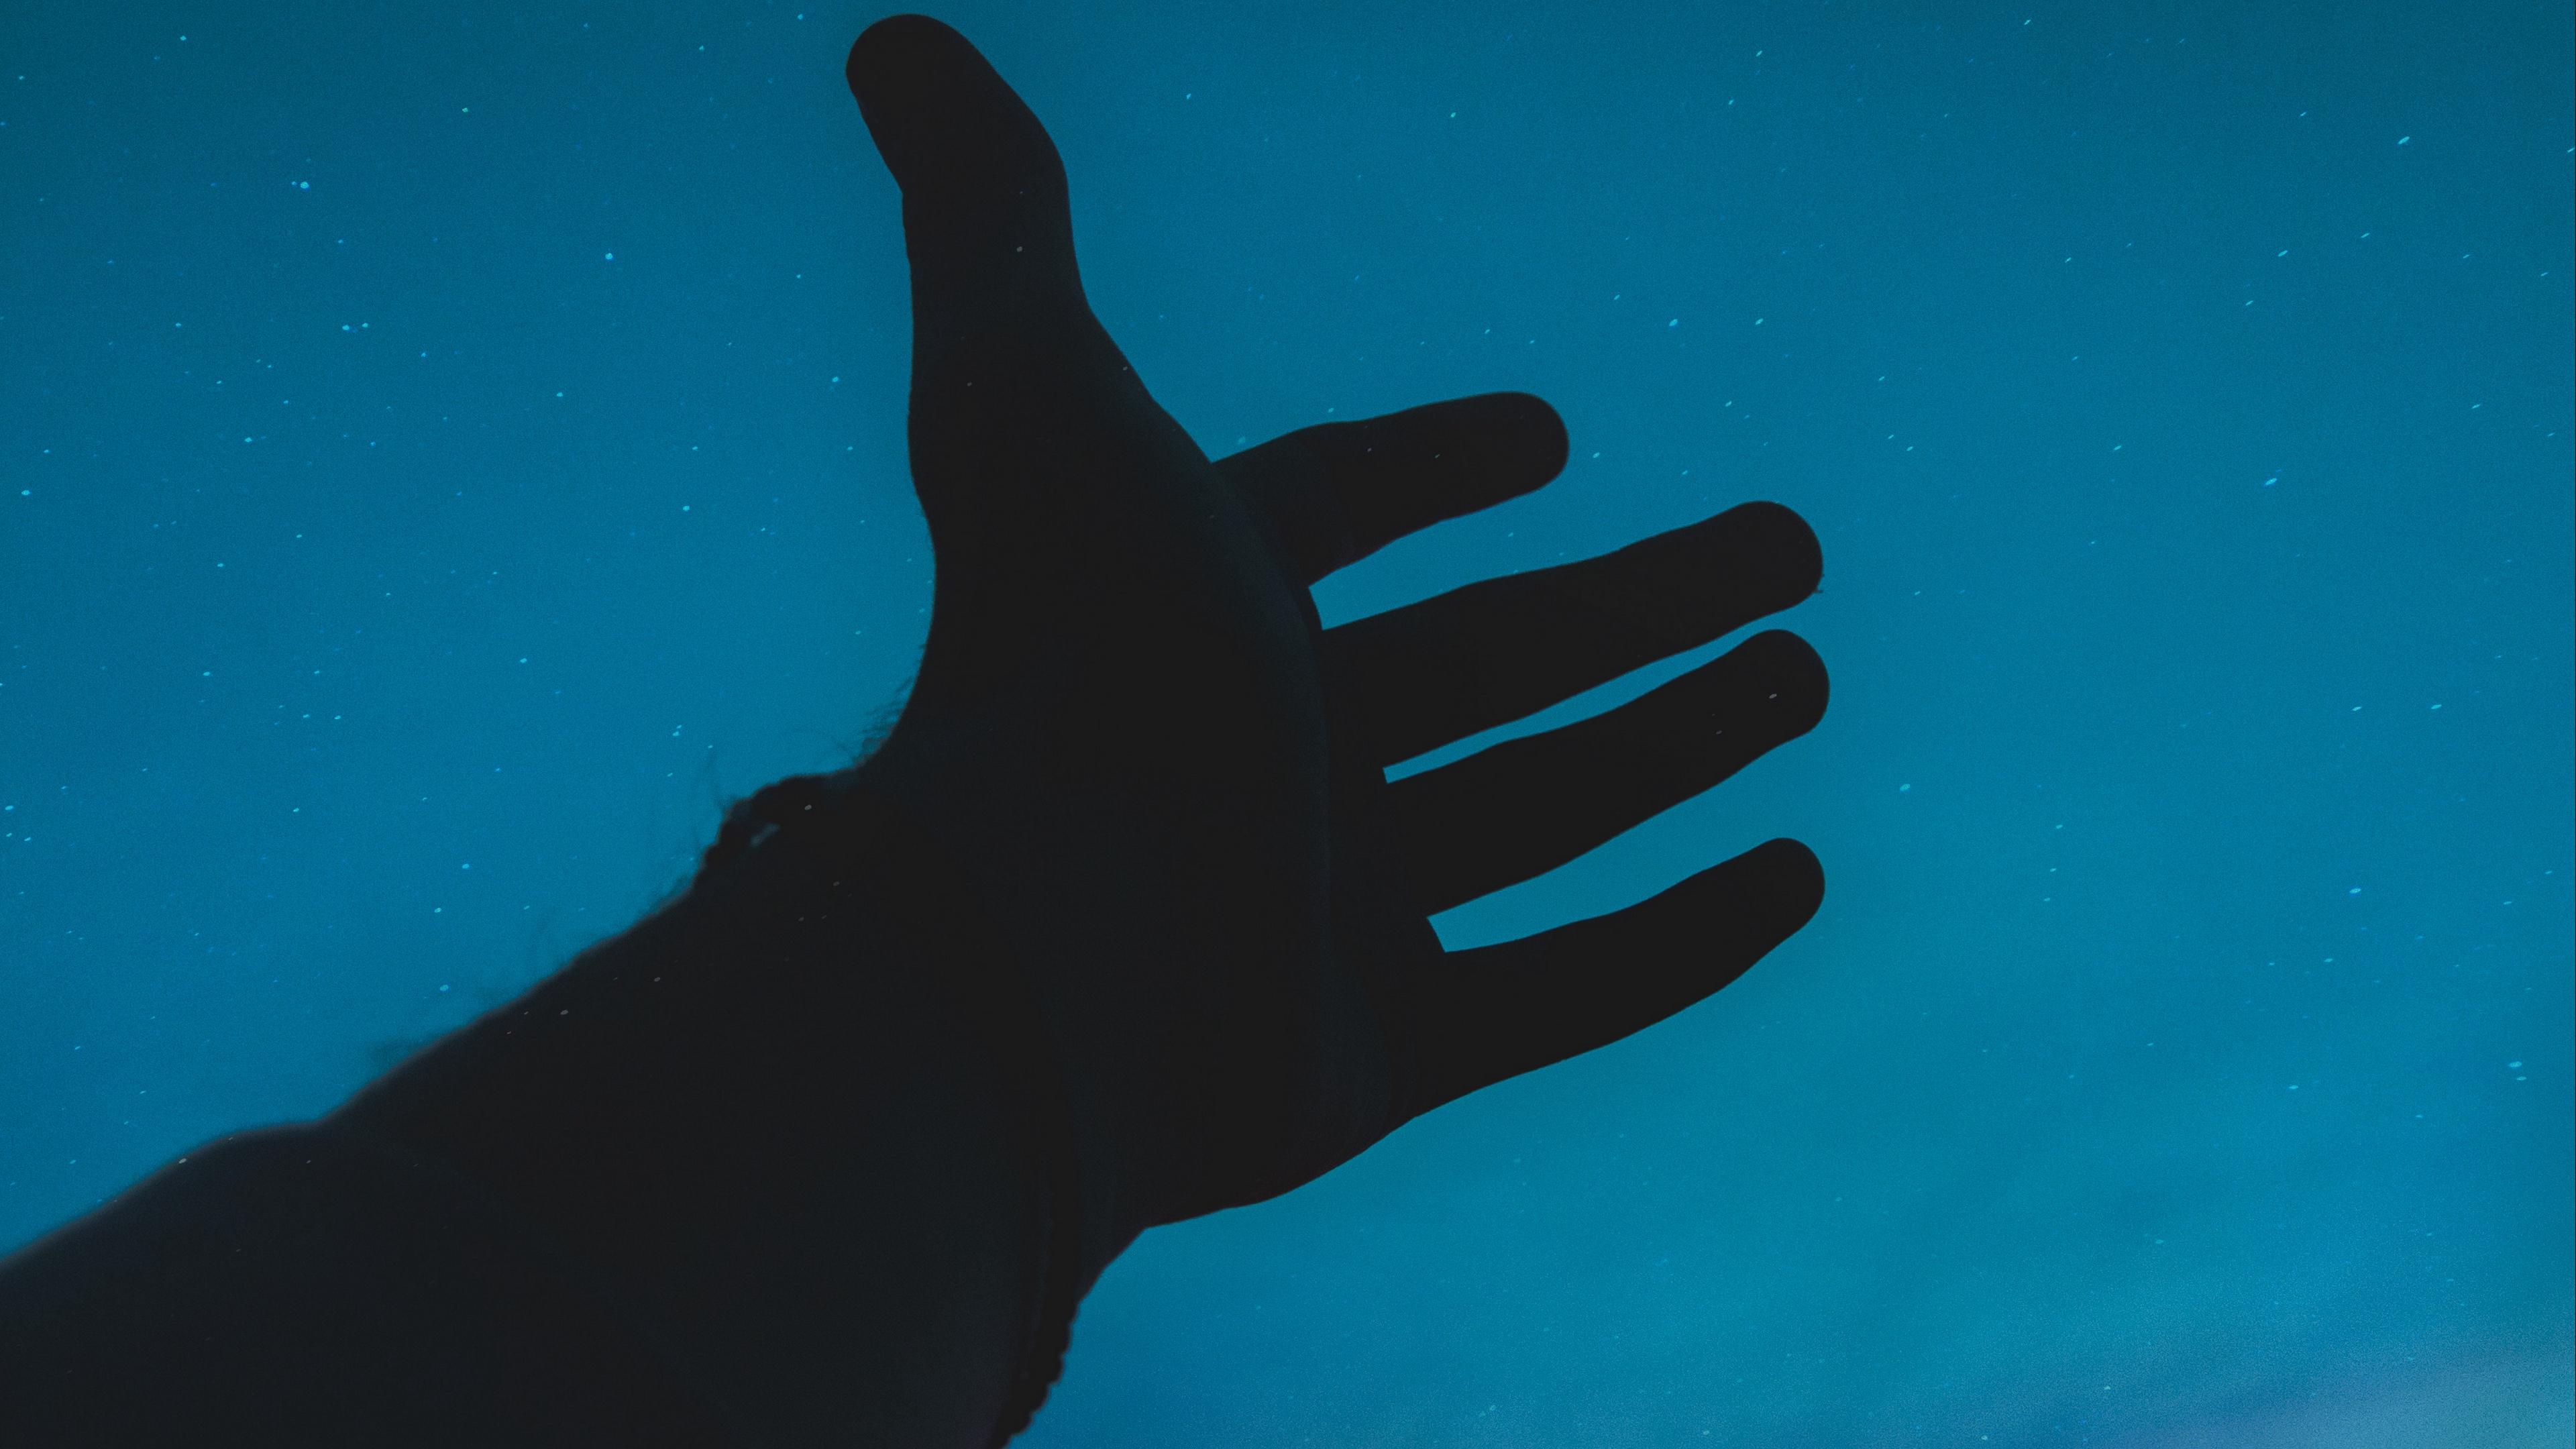 hand sky silhouette 4k 1540574910 - hand, sky, silhouette 4k - Sky, Silhouette, hand